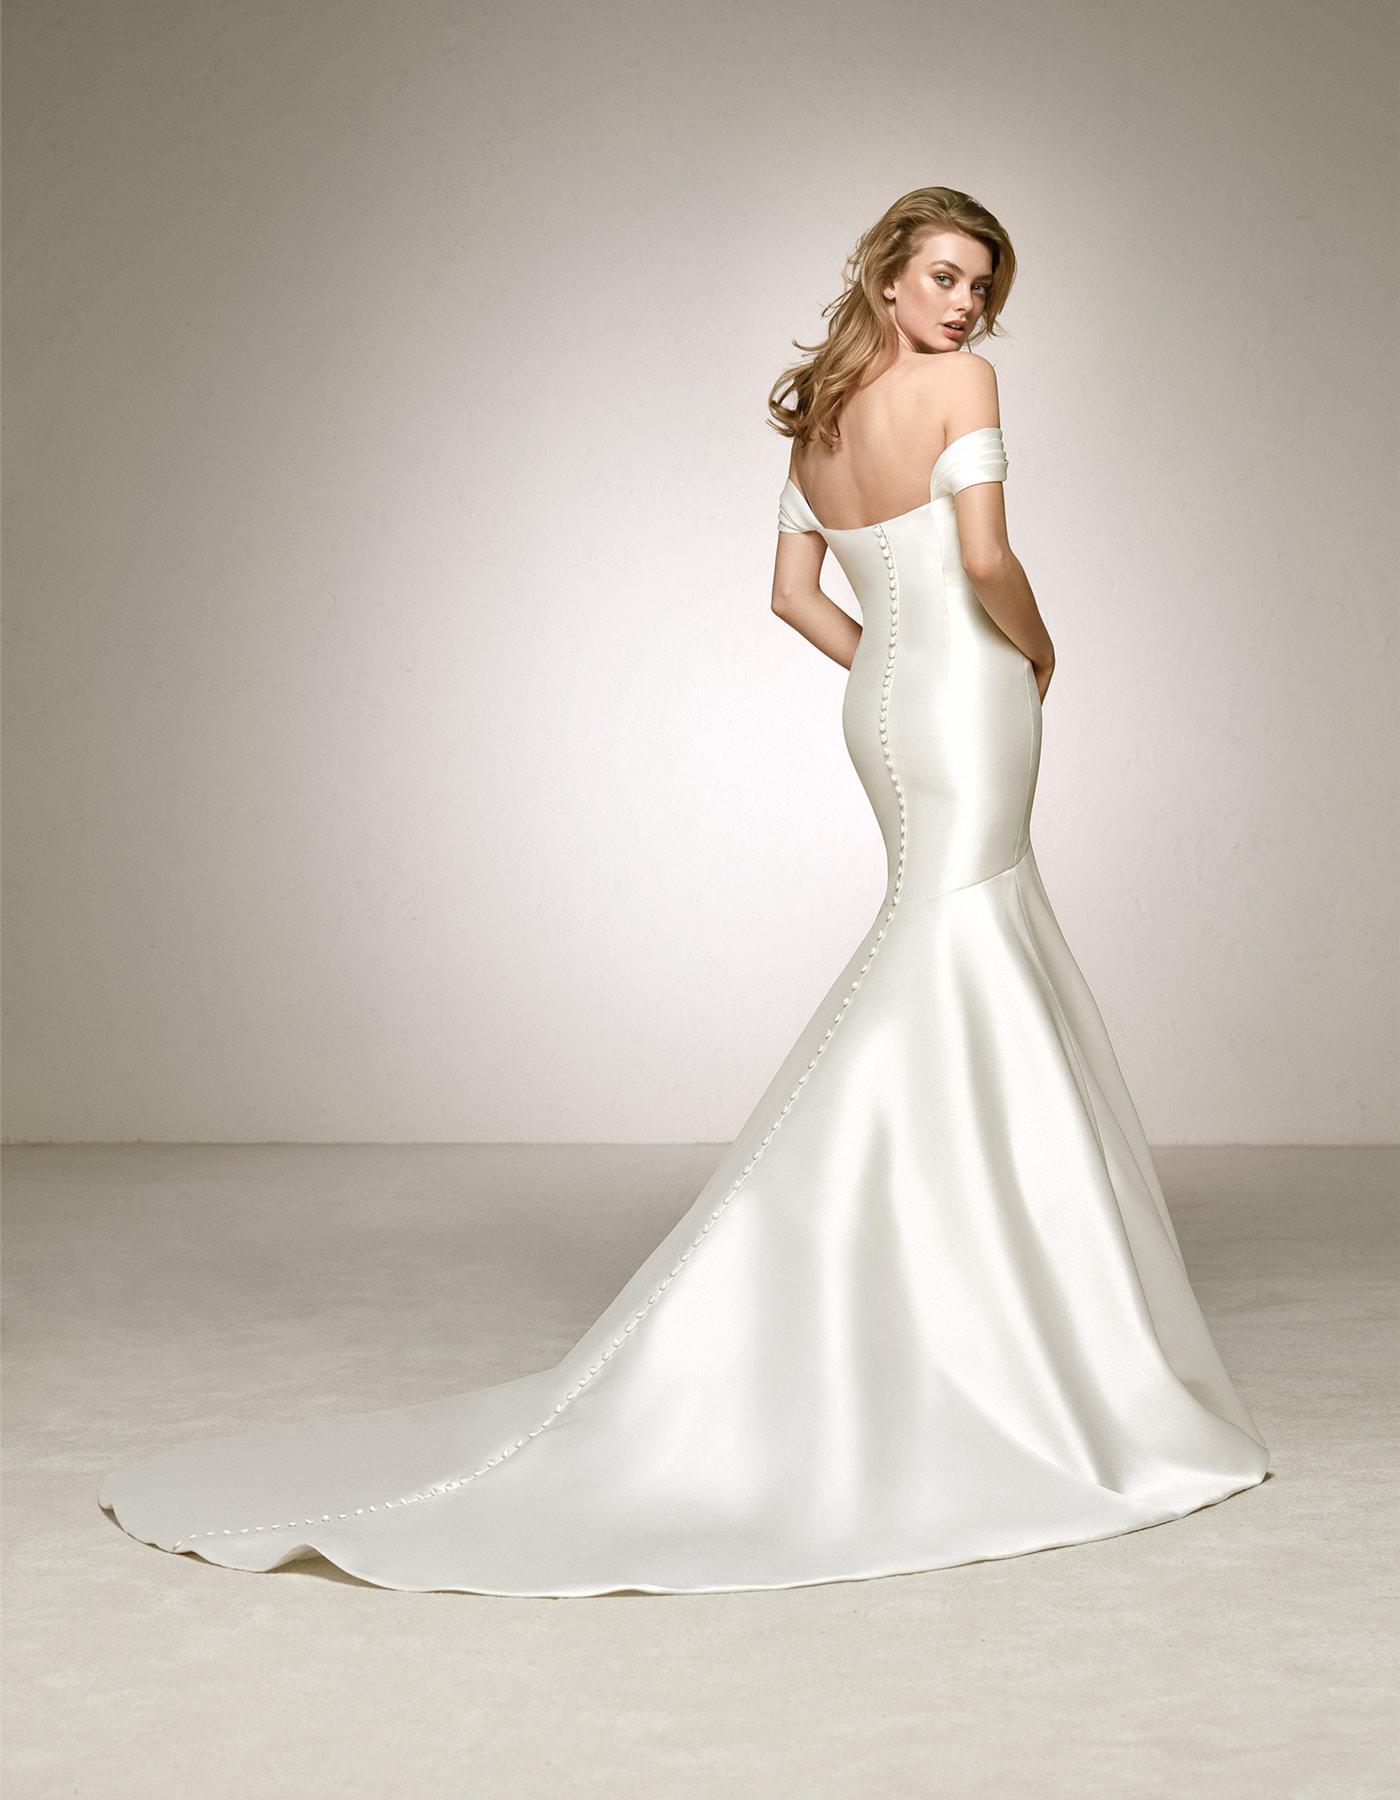 silk wedding dresses with sleeves photo - 1